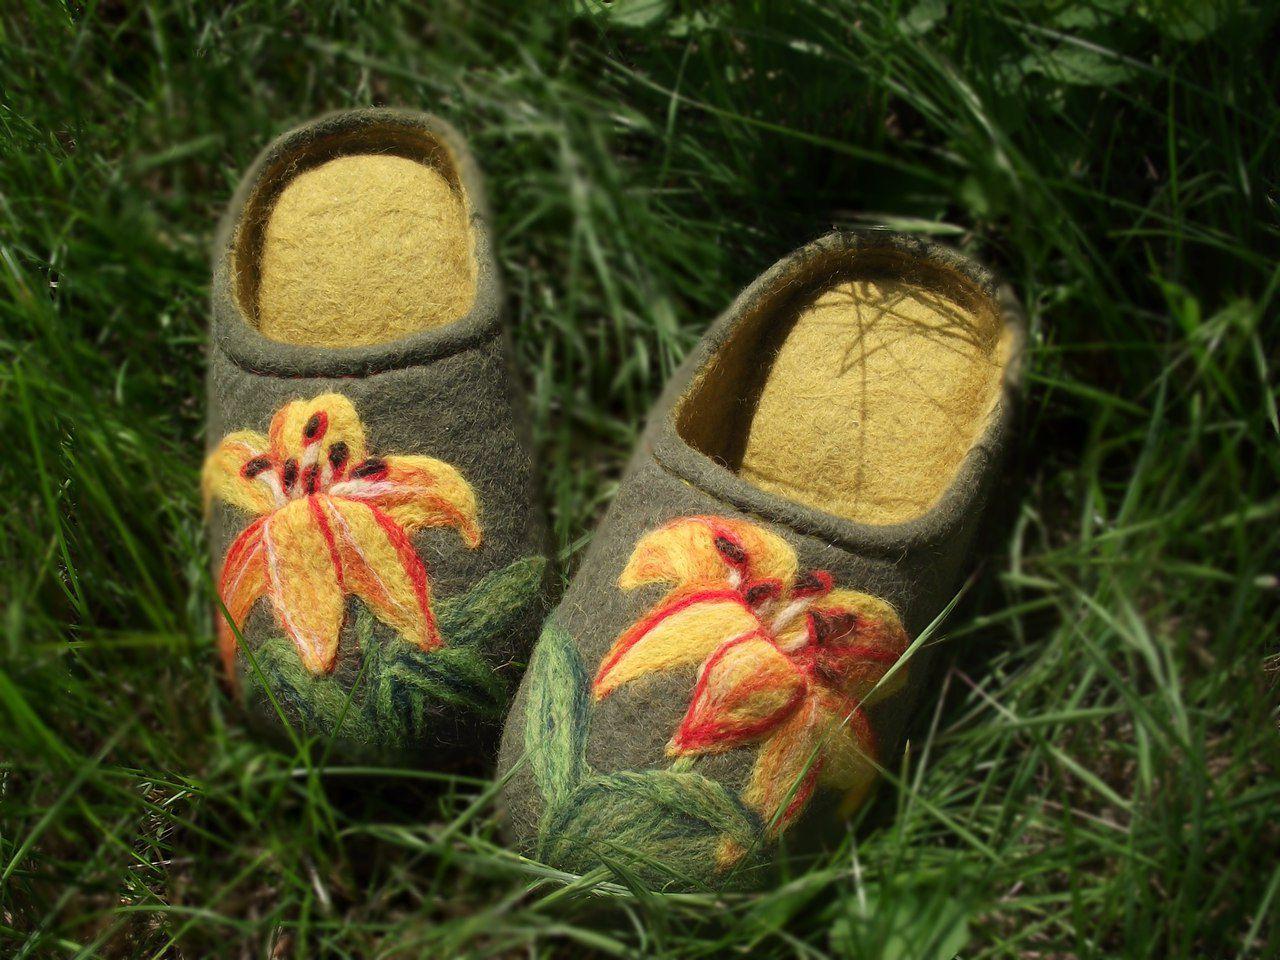 эко валяная домашняя шерсть обувь